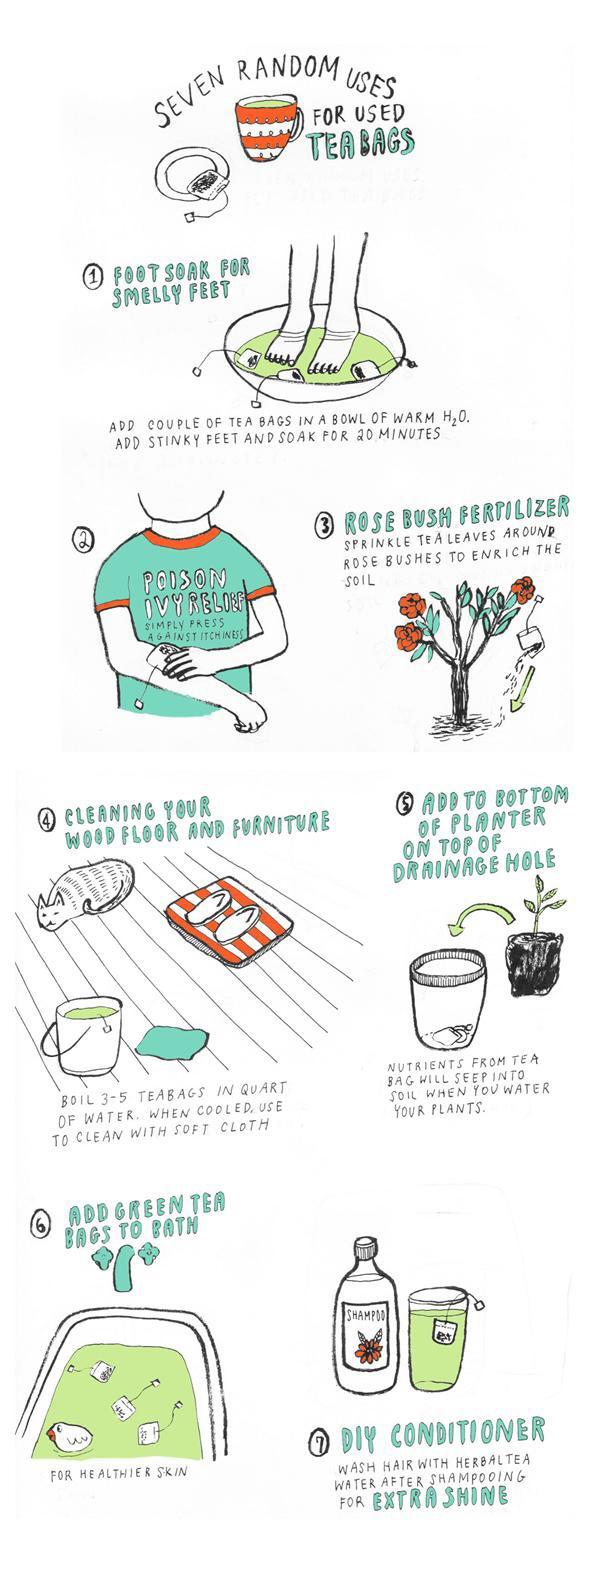 7 random uses for used tea bags the secret yumiverse wonderhowto - Uses for tea bags ...